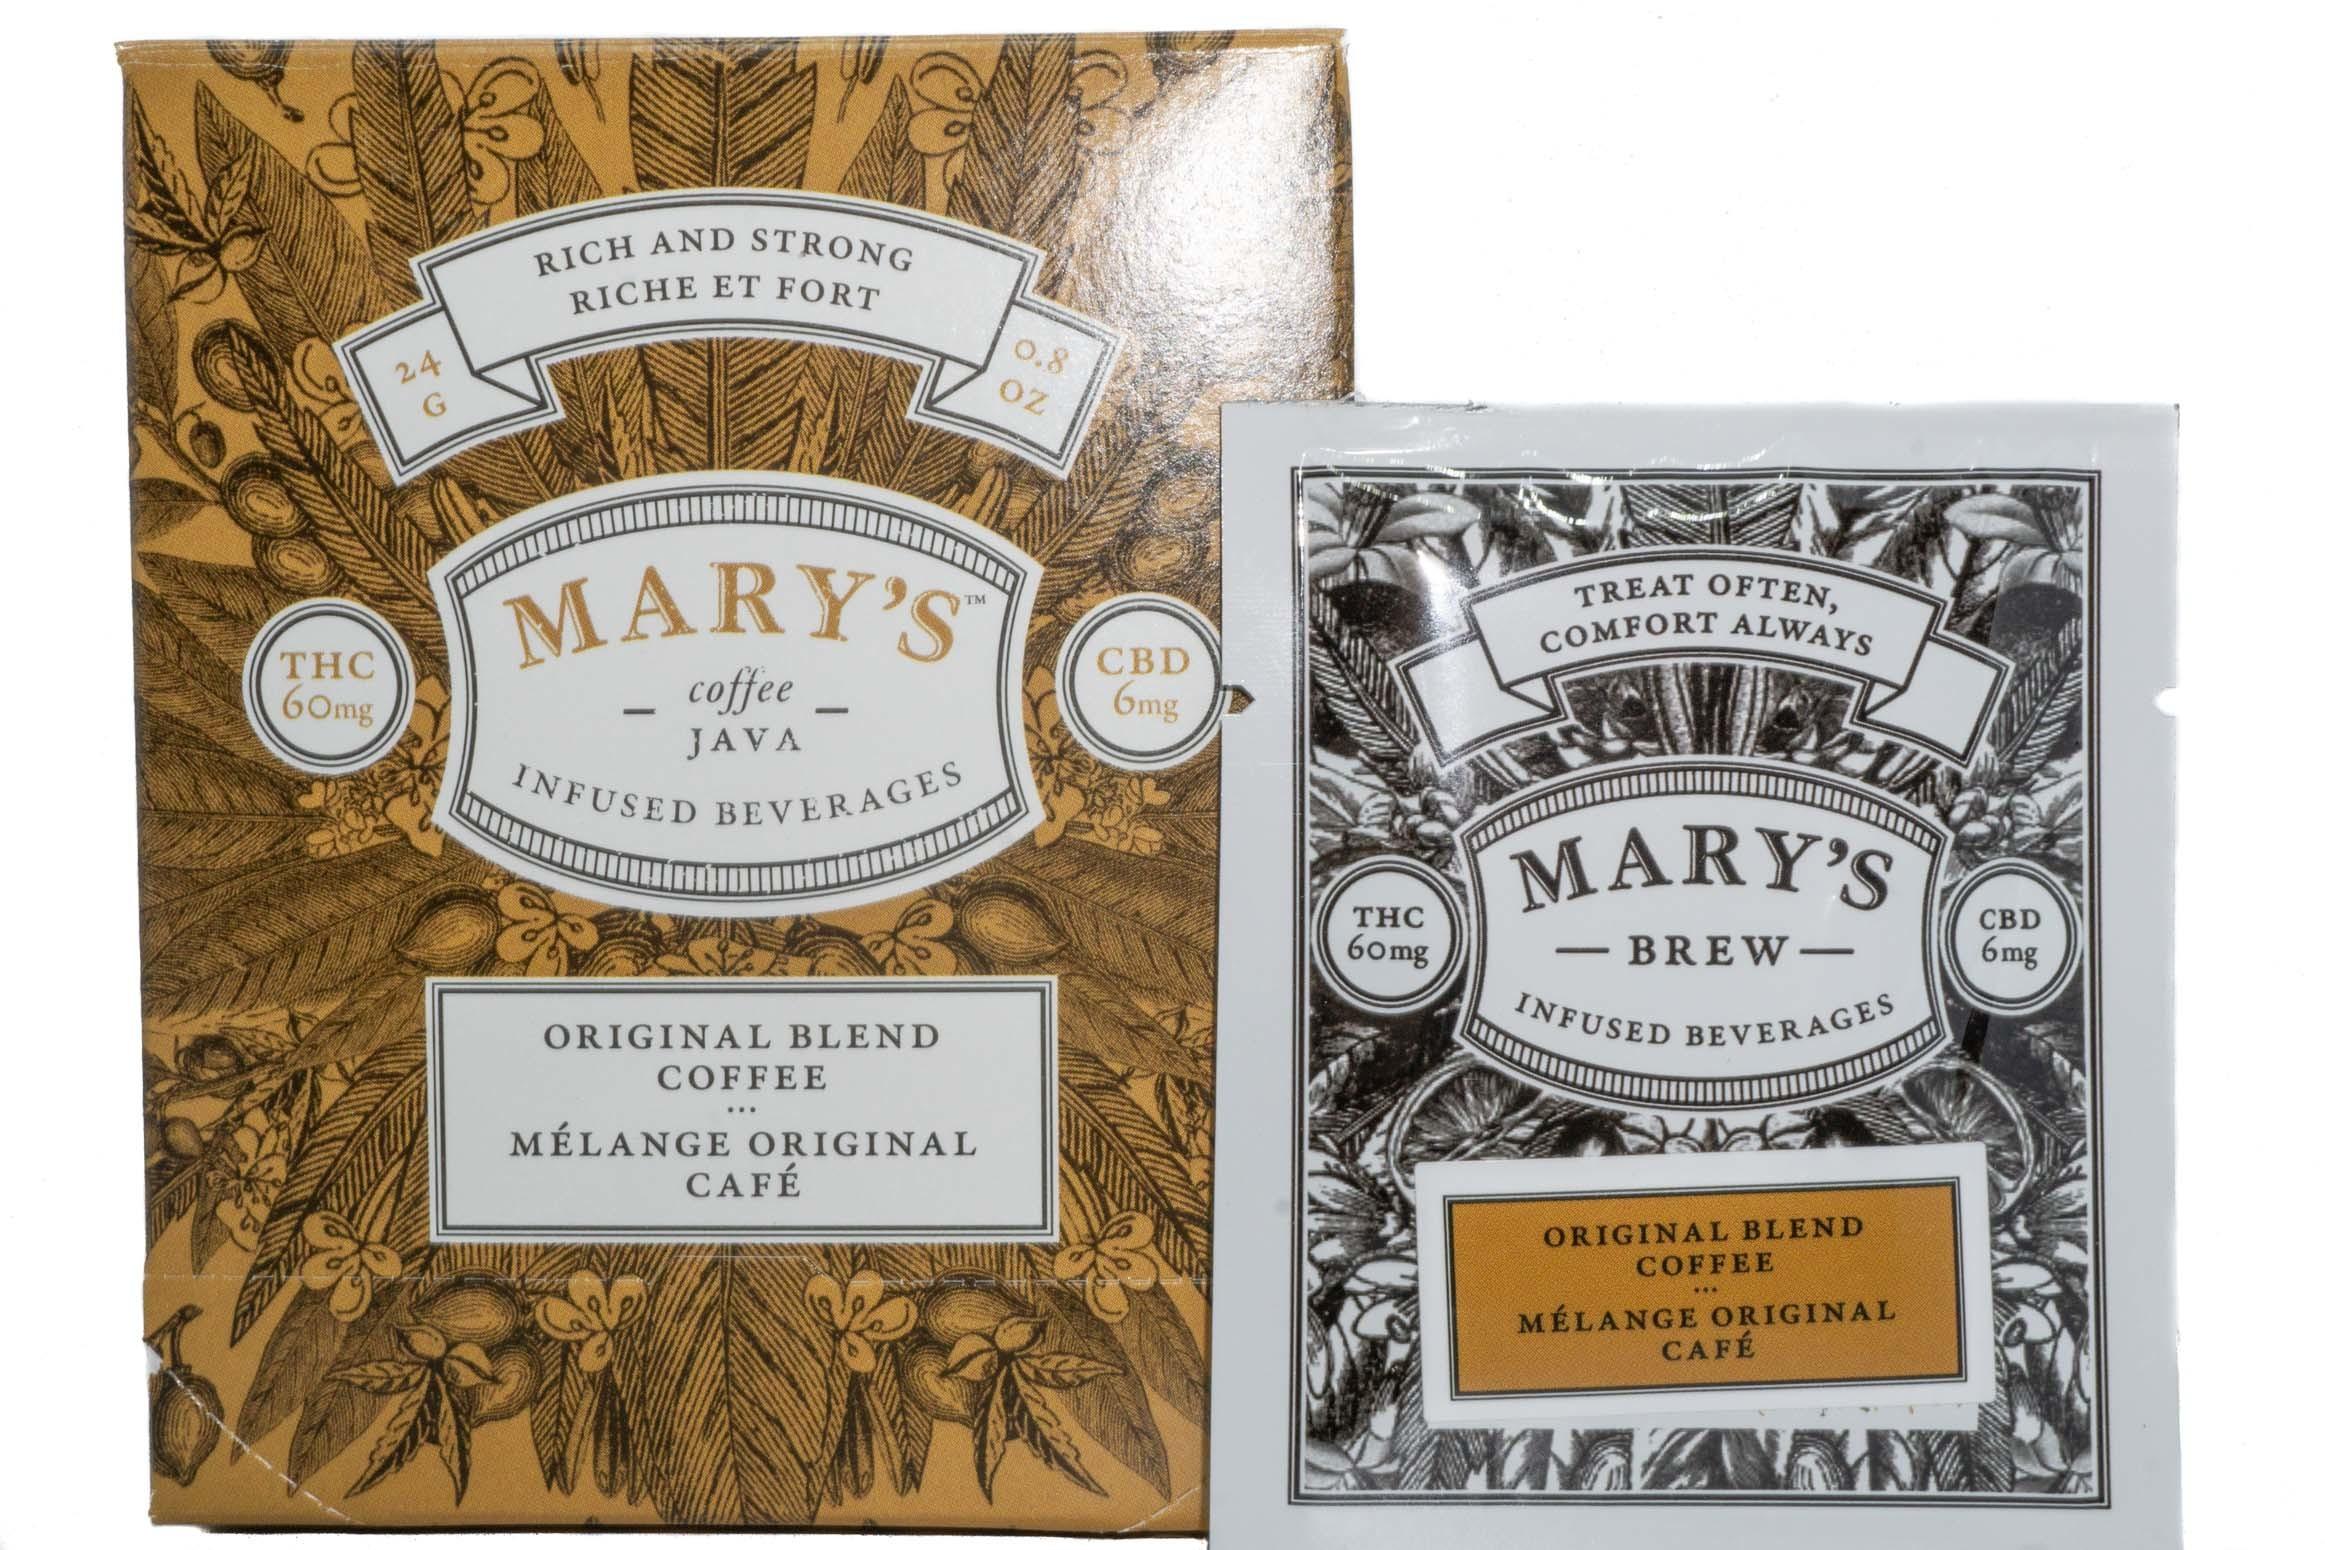 Mary's Wellness Coffee/Java (Original Blend) (Single Sachet) (60mg THC/6mg CBD) 01241